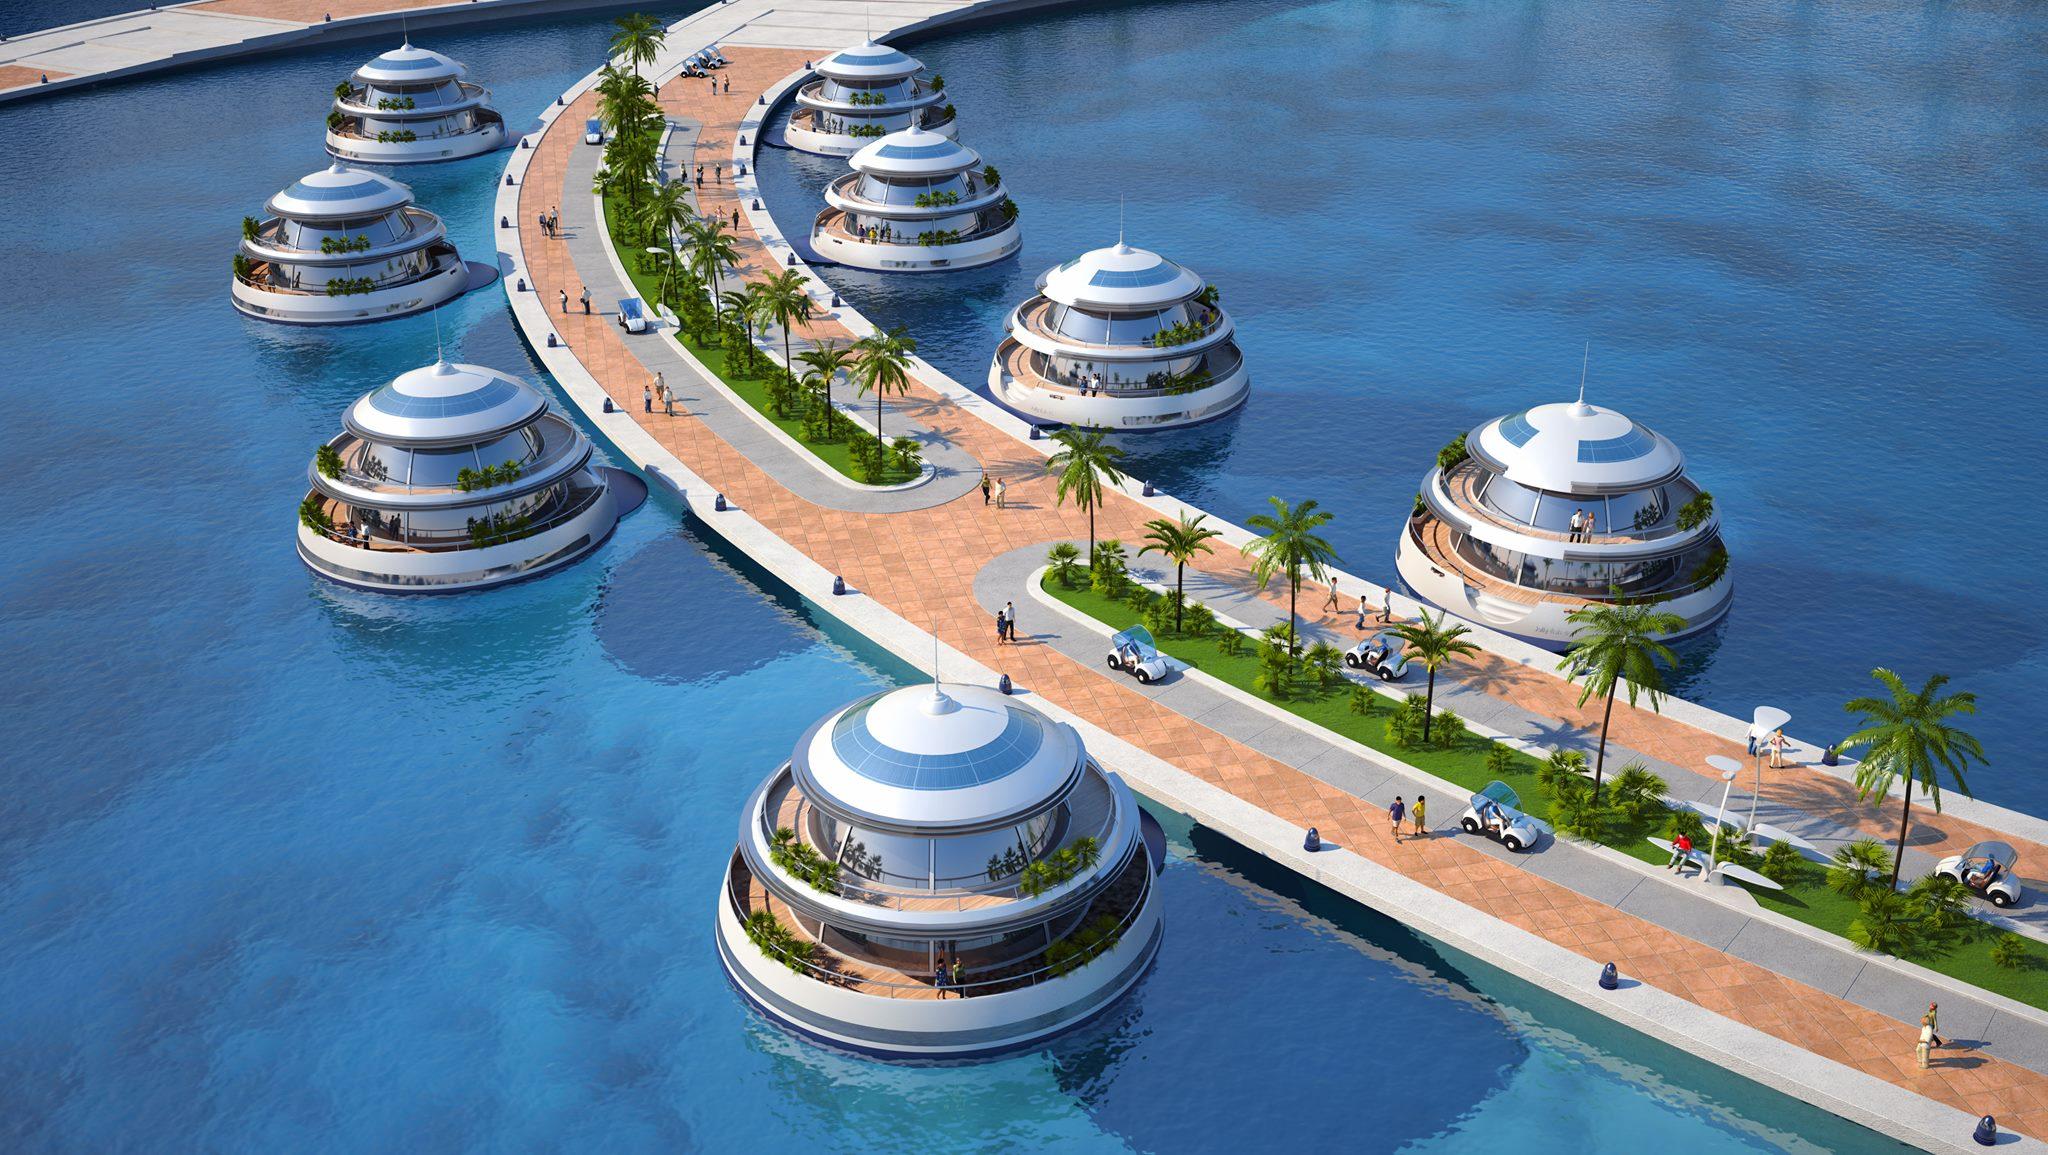 Amphibious 1000 Resort 2